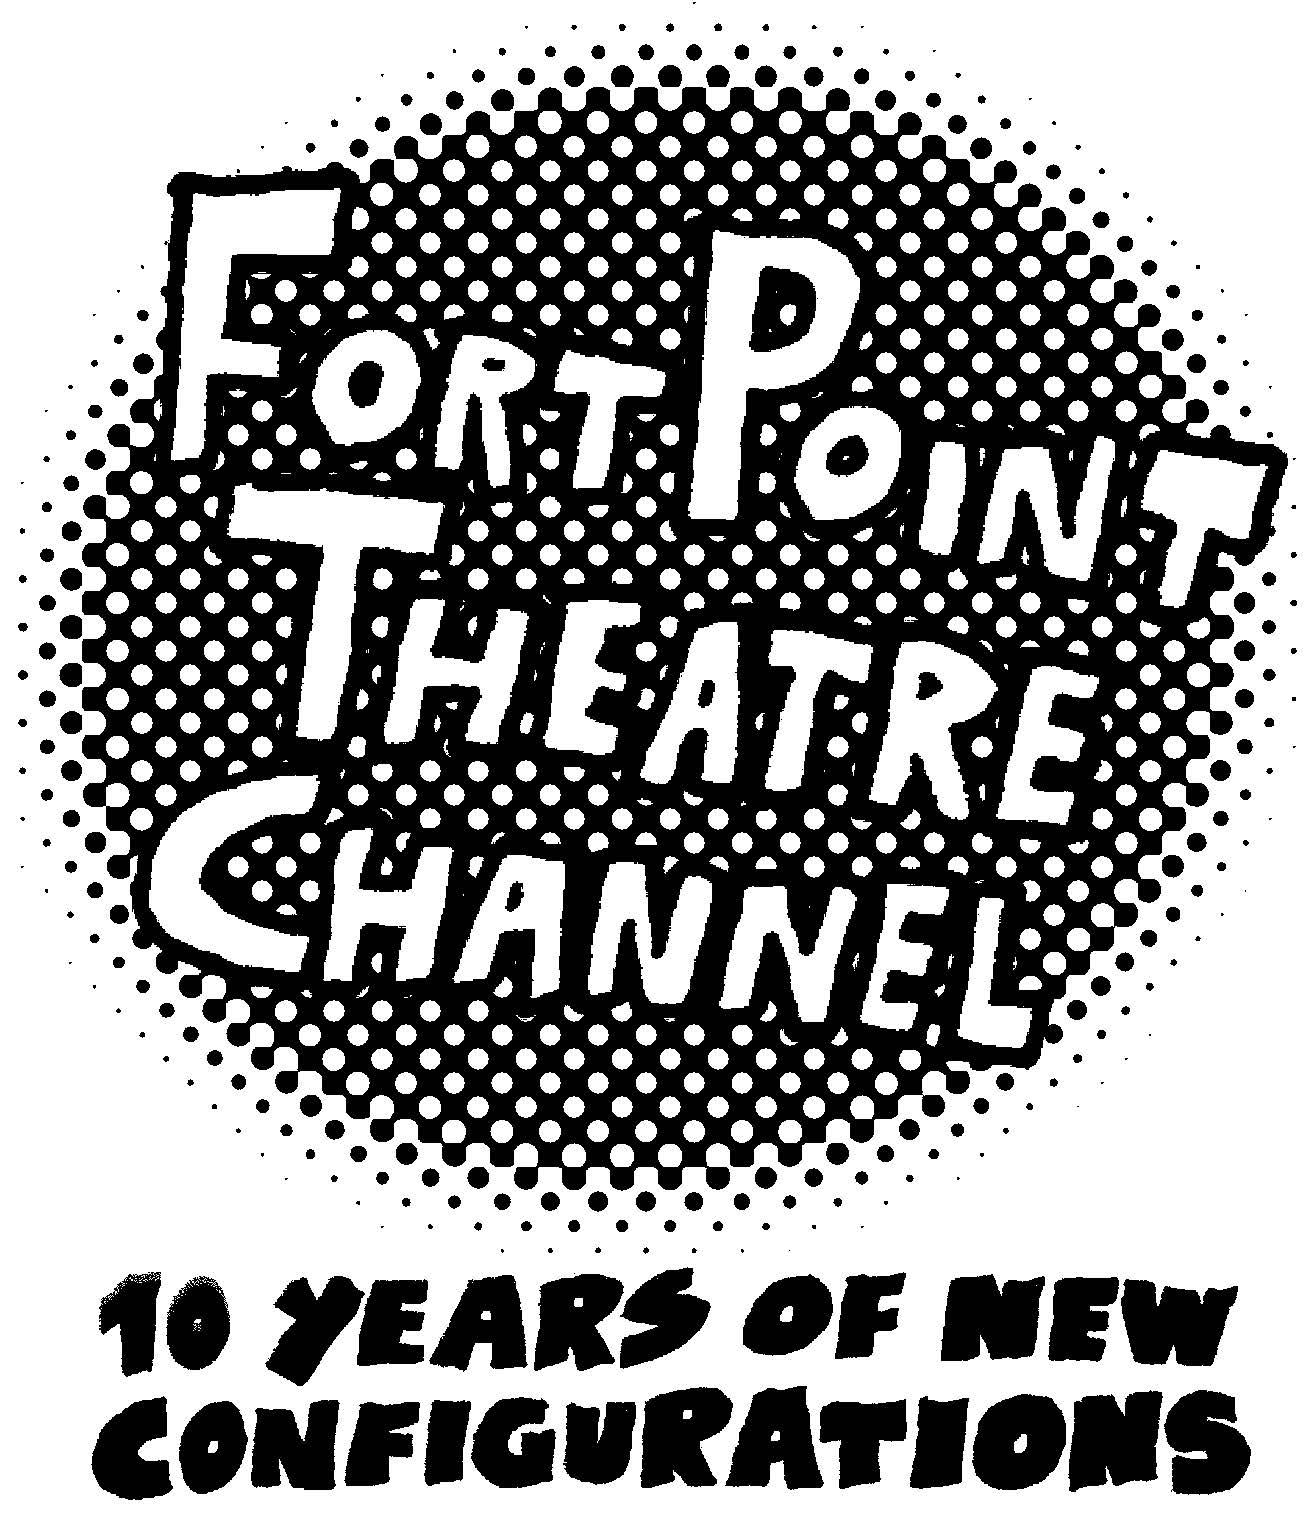 FortPointTheatreChannel_10 year_square.jpg